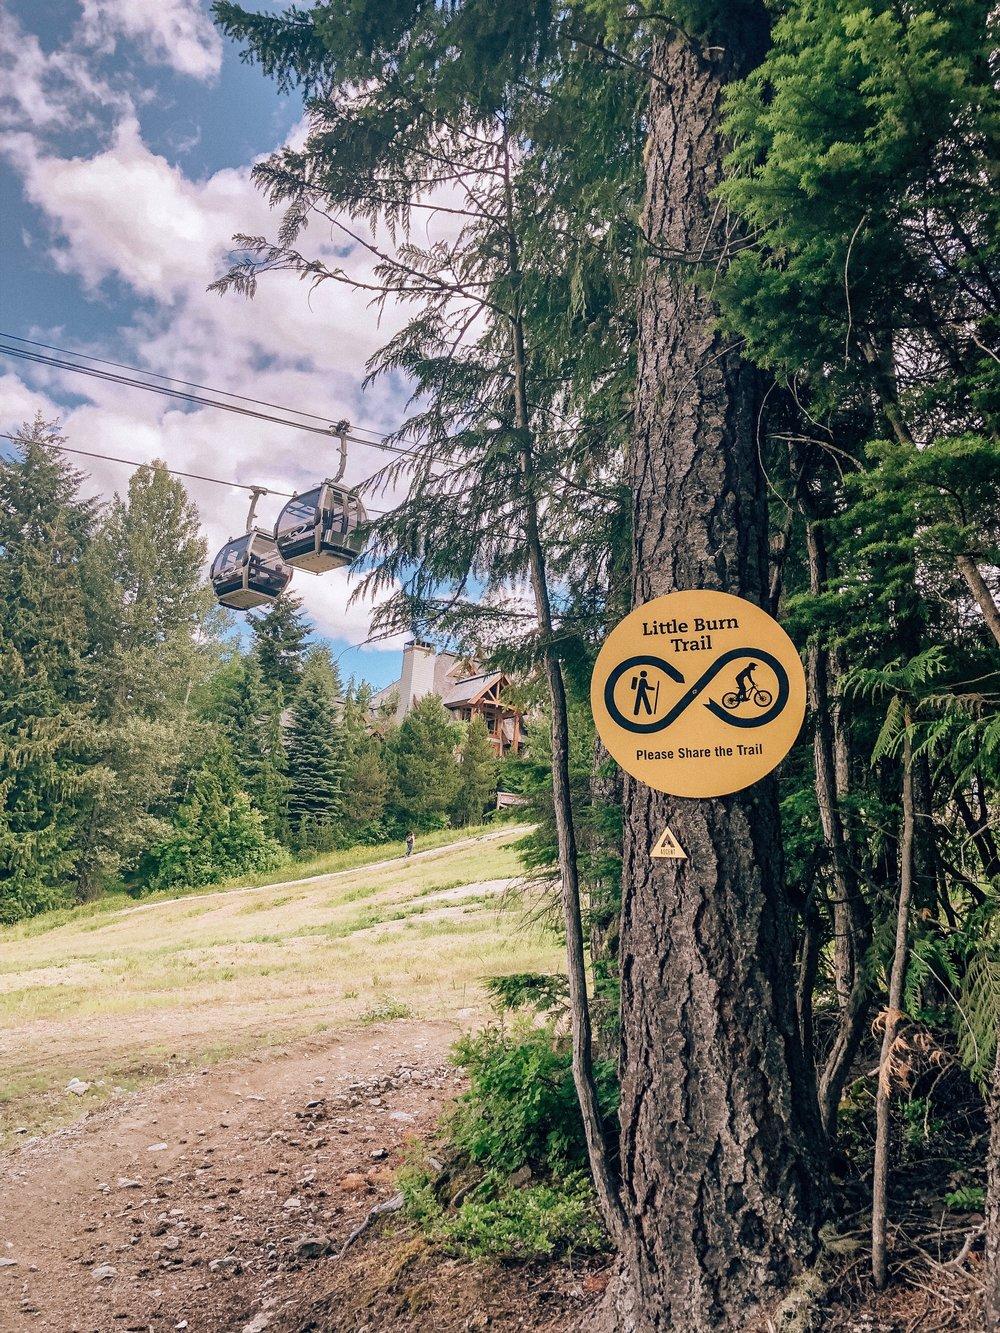 Little Burn Trail on Ascent Trail Hike Whistler Blackcomb